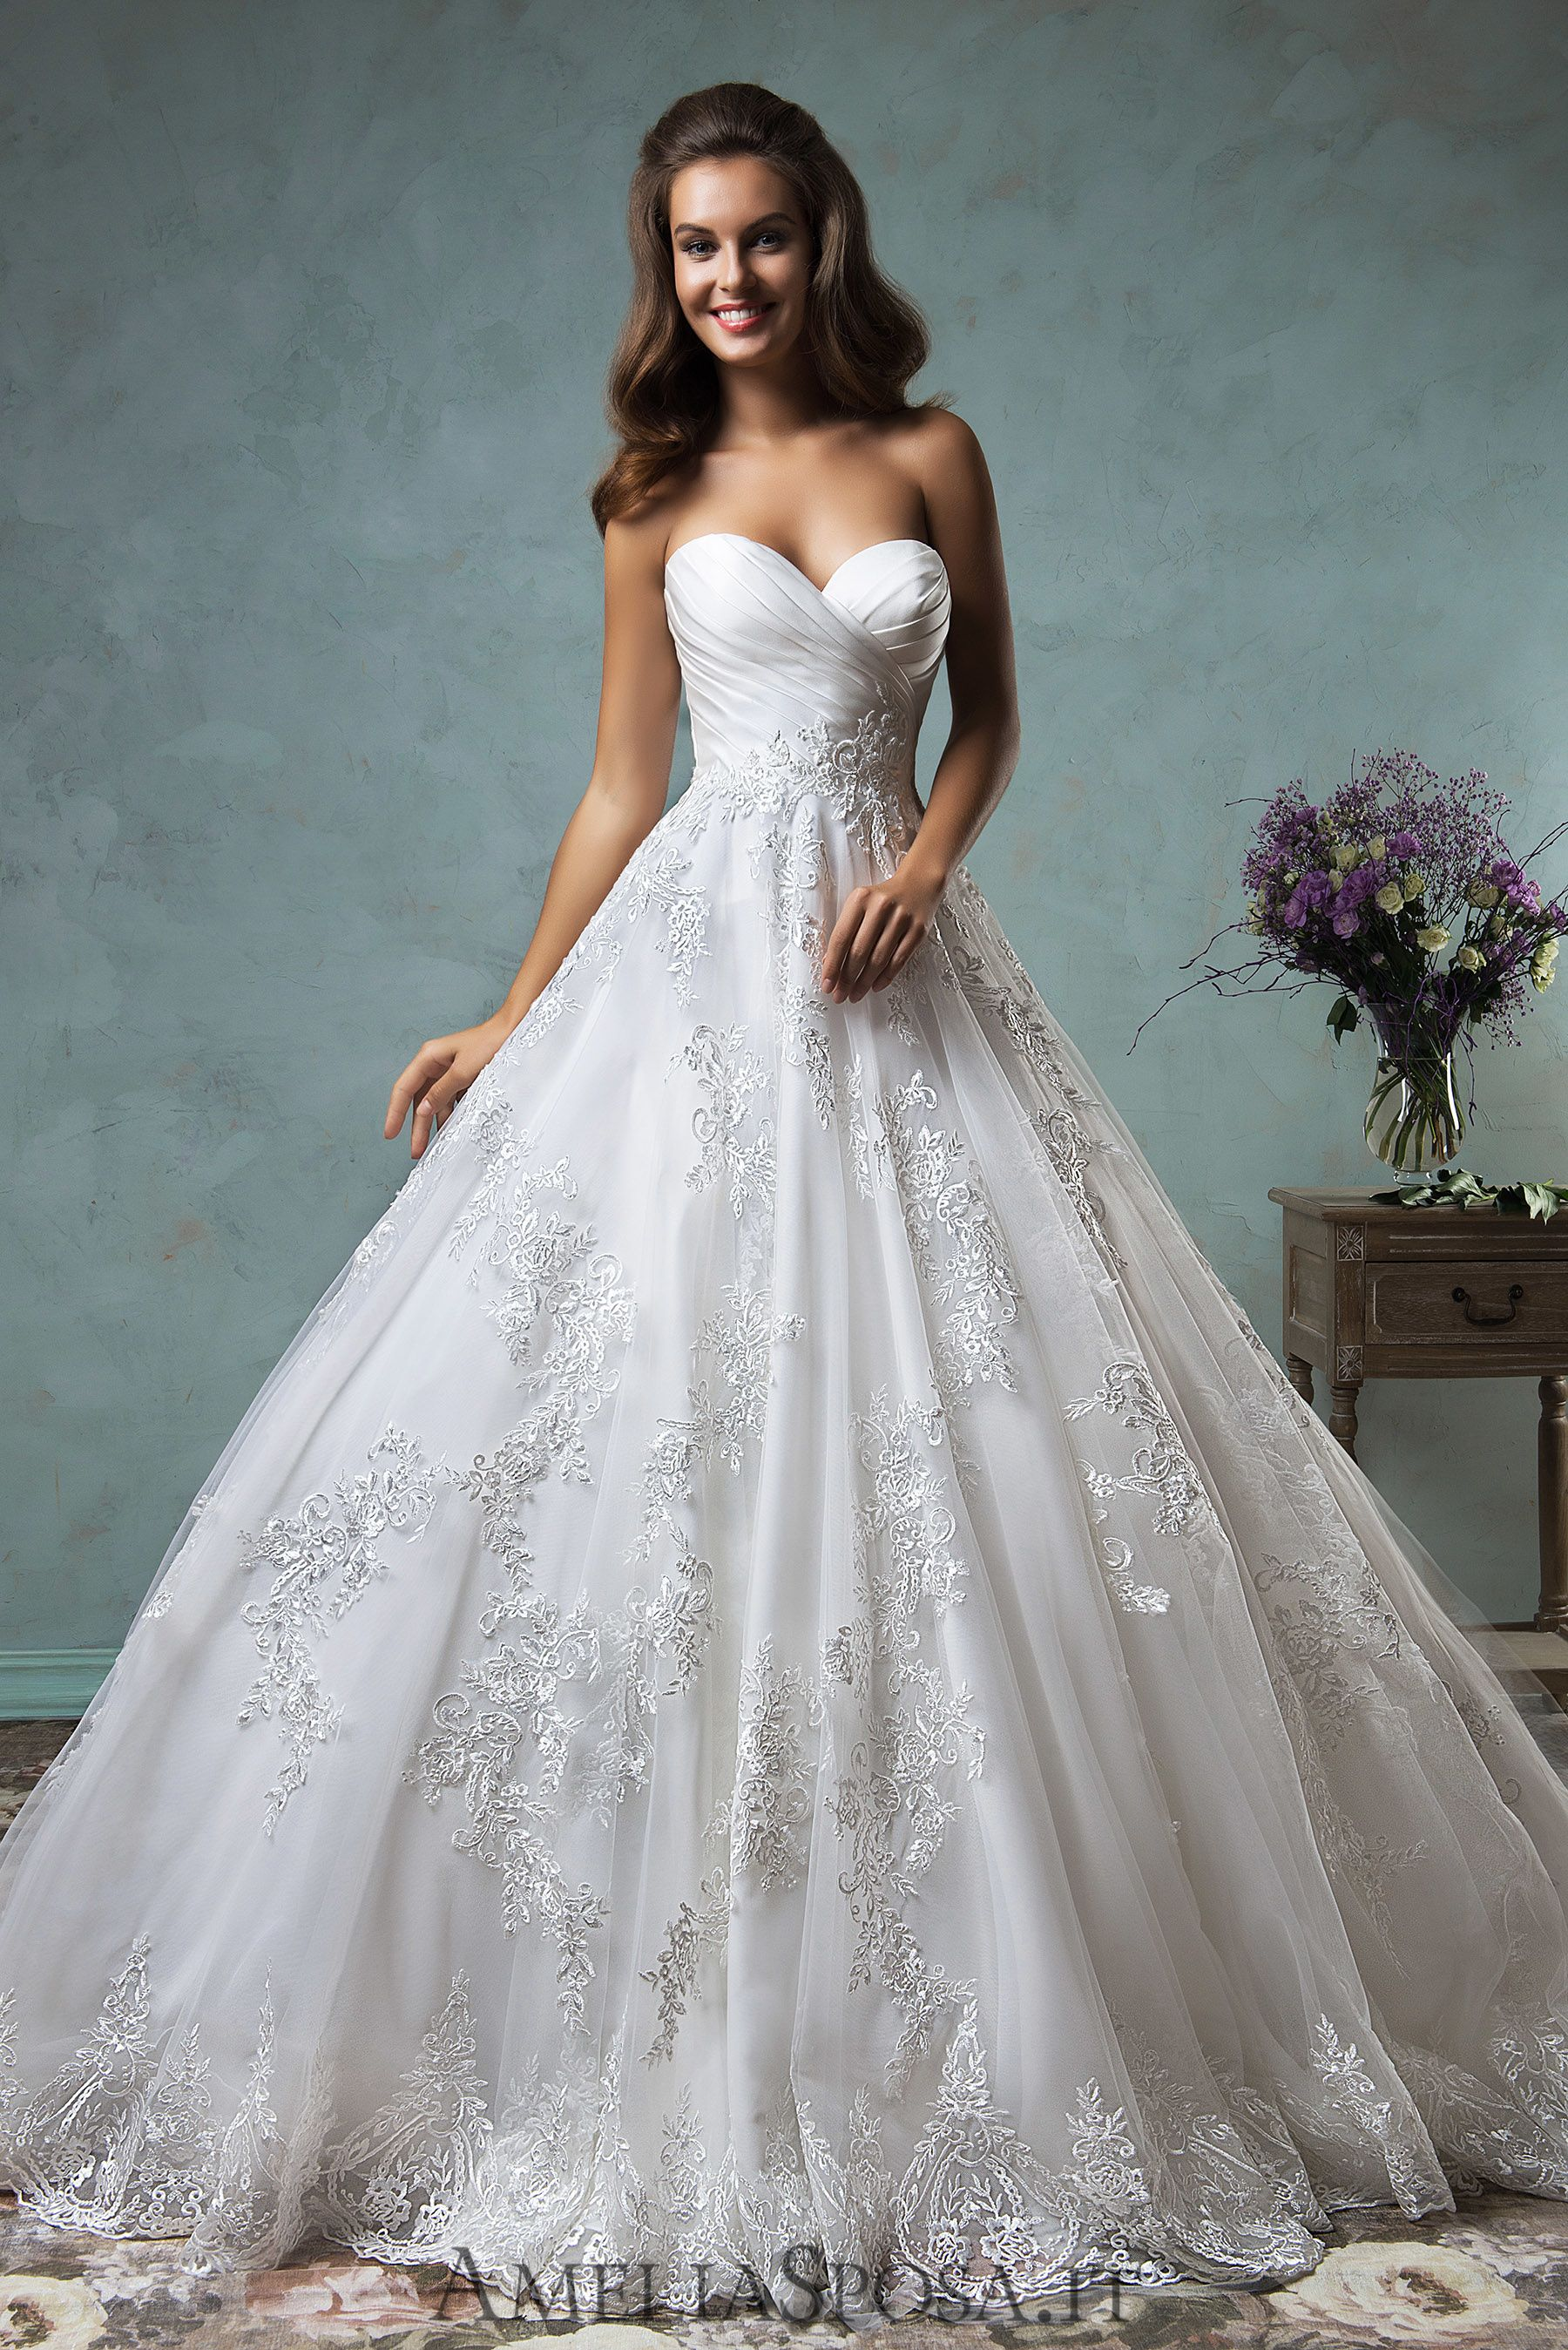 Wedding Dress Deline, Silhouette: A-Line | Amelia Sposa collection ...